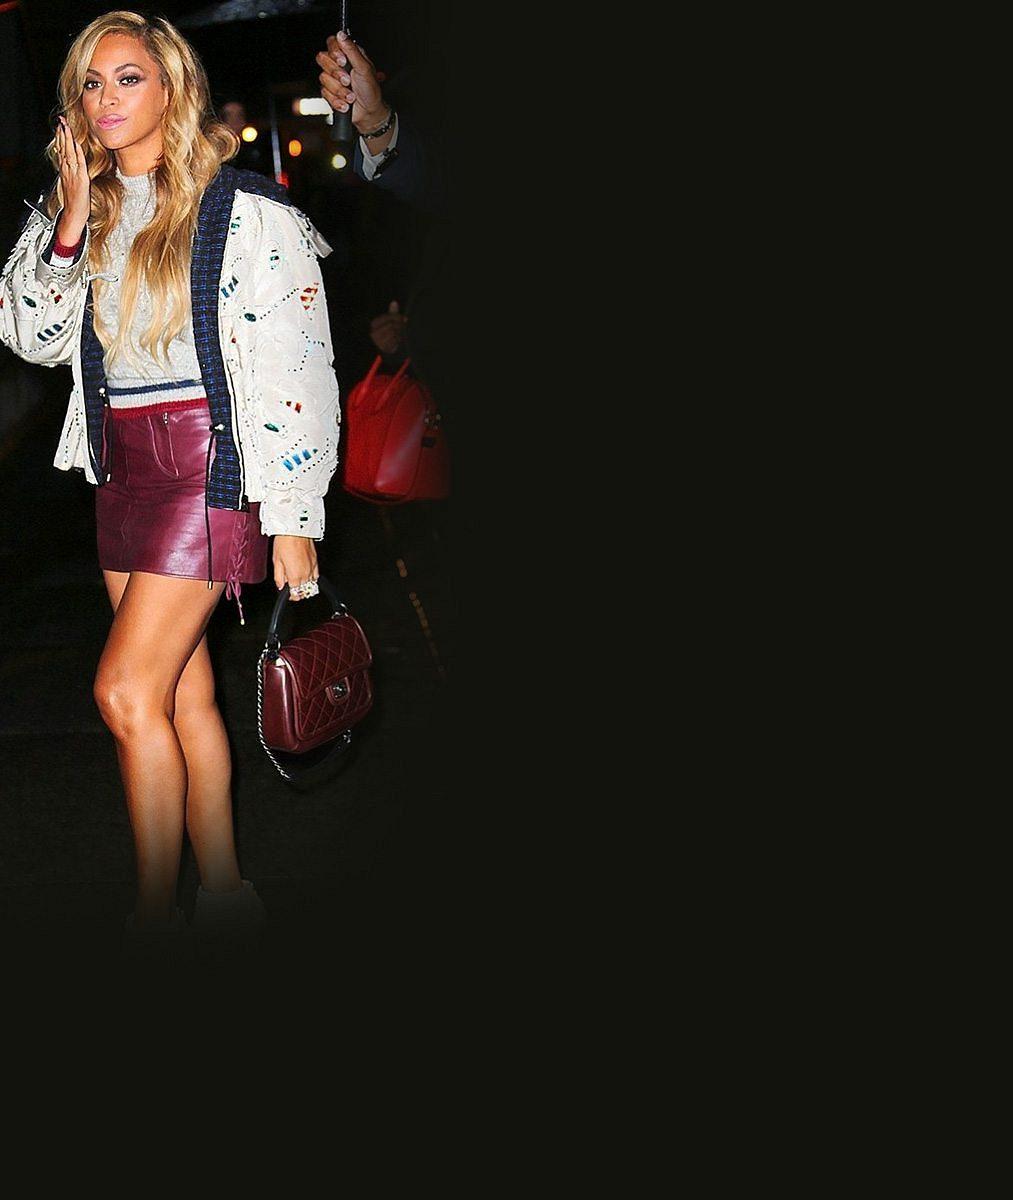 Z Beyoncé nikdy nebude usedlá mamina: V kožené minisukni provokovala jako sexy studentka